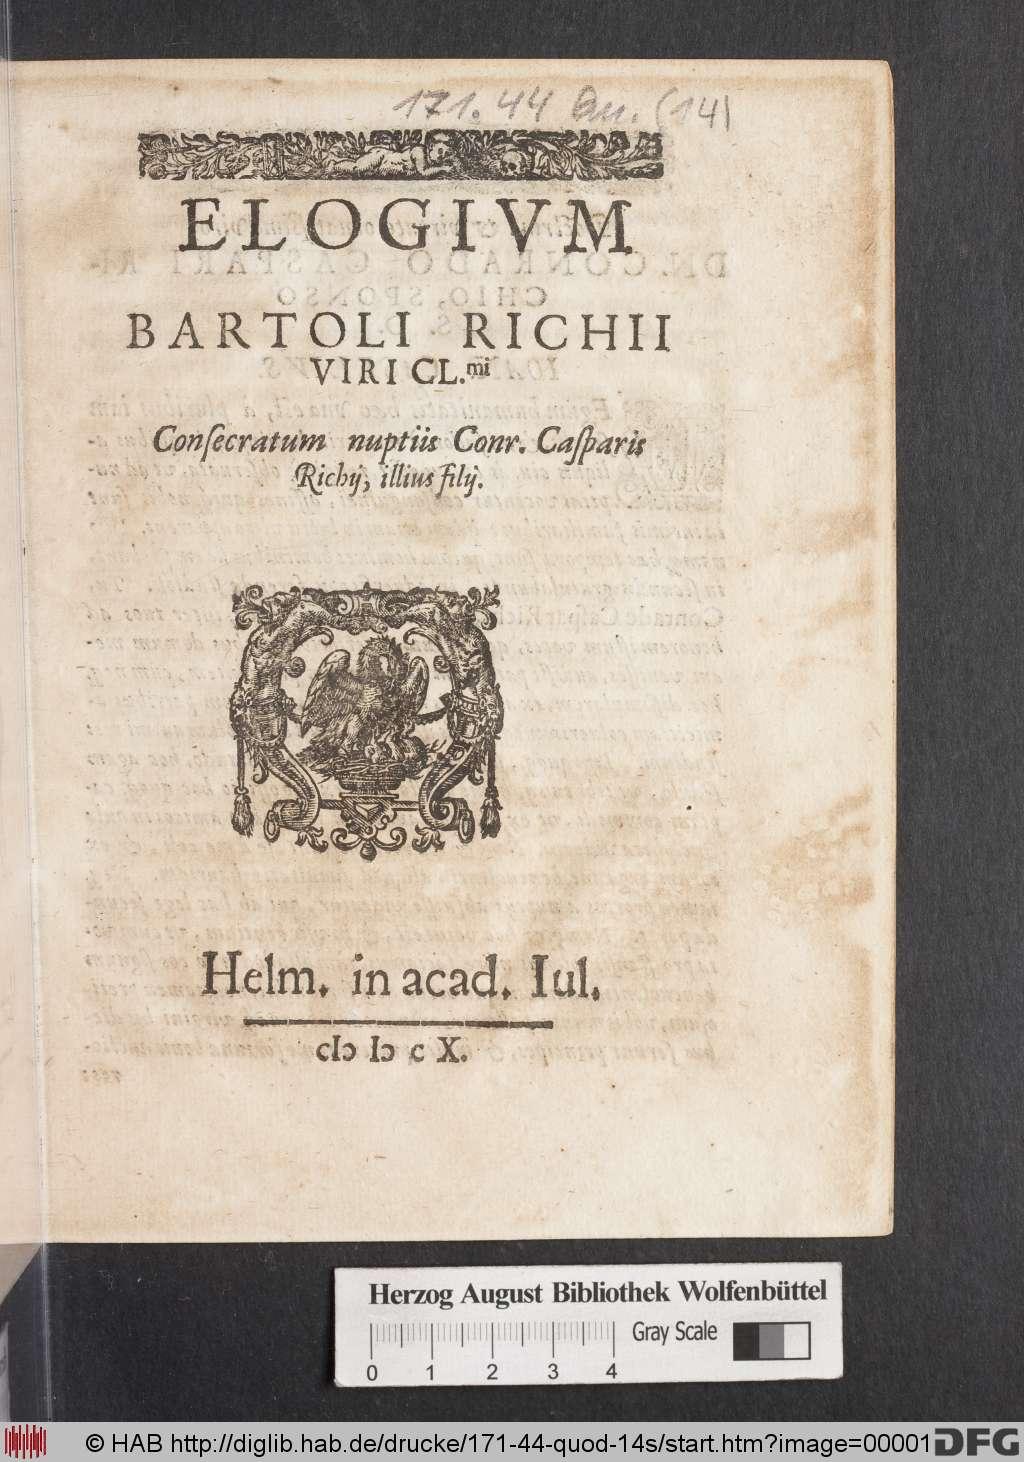 http://diglib.hab.de/drucke/171-44-quod-14s/00001.jpg